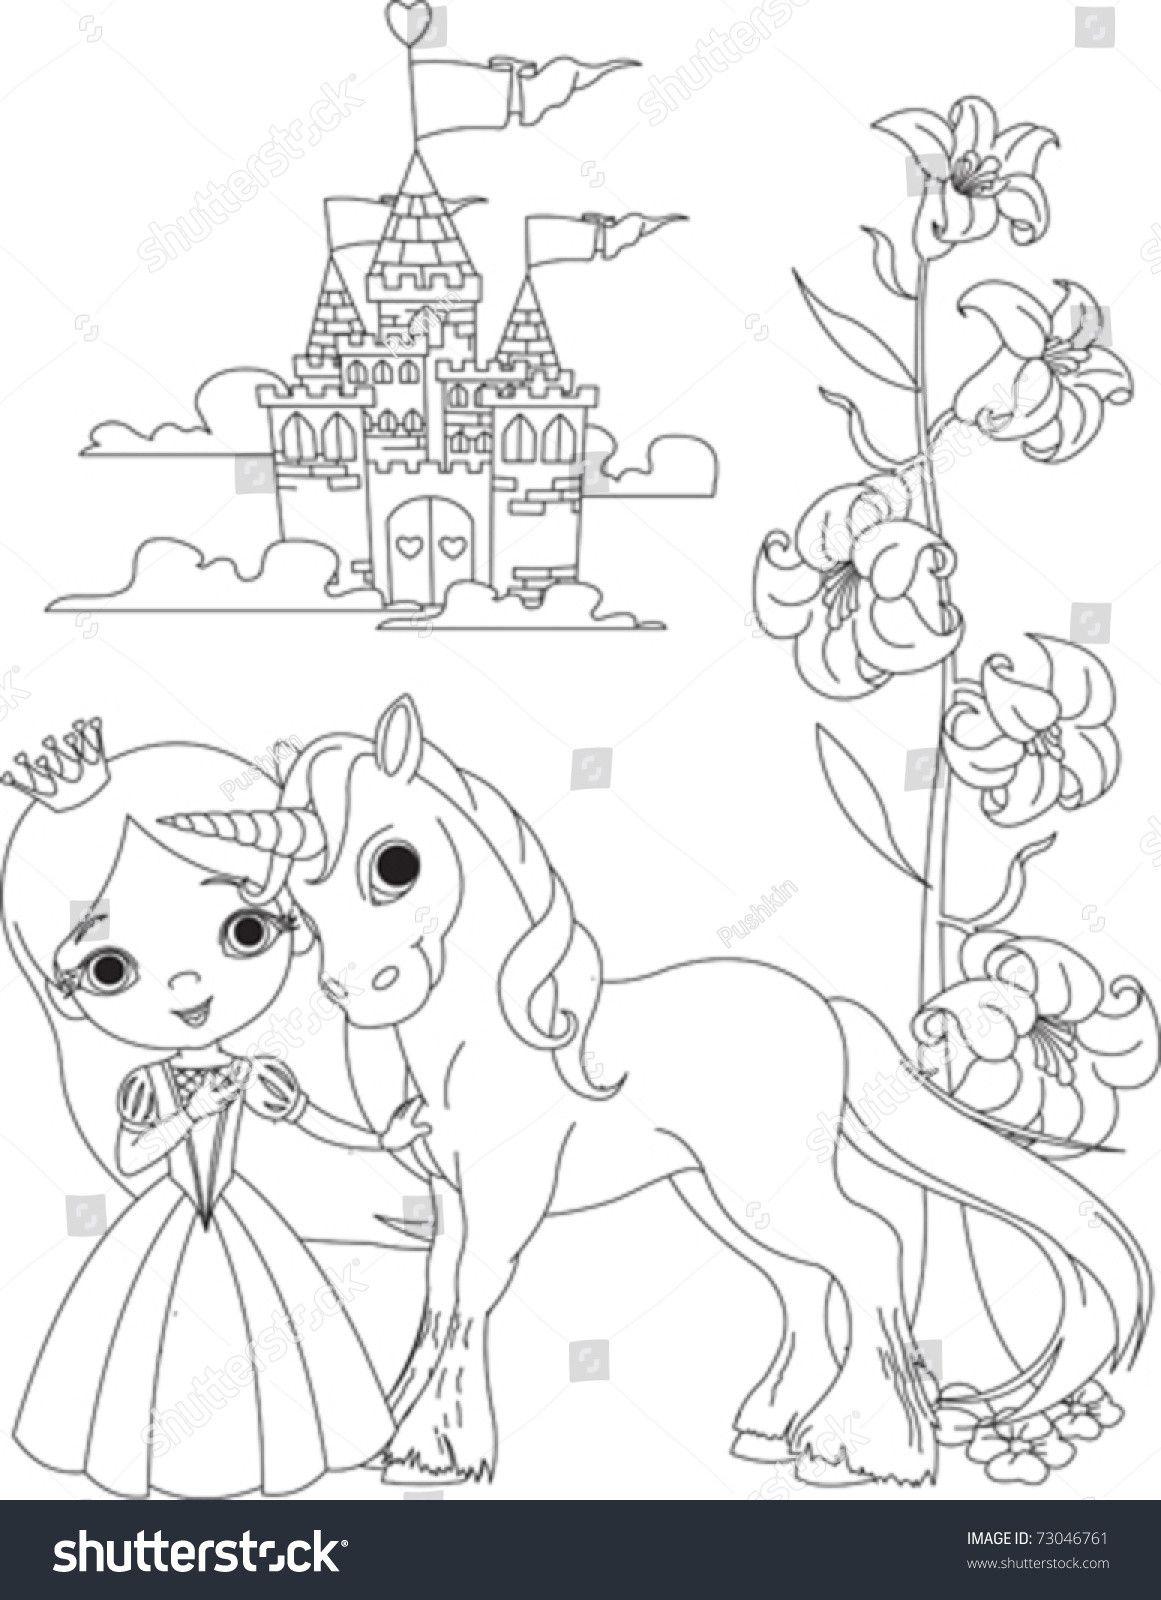 Princess Unicorn Coloring Page In 2020 Unicorn Coloring Pages Princess Coloring Pages Princess Coloring